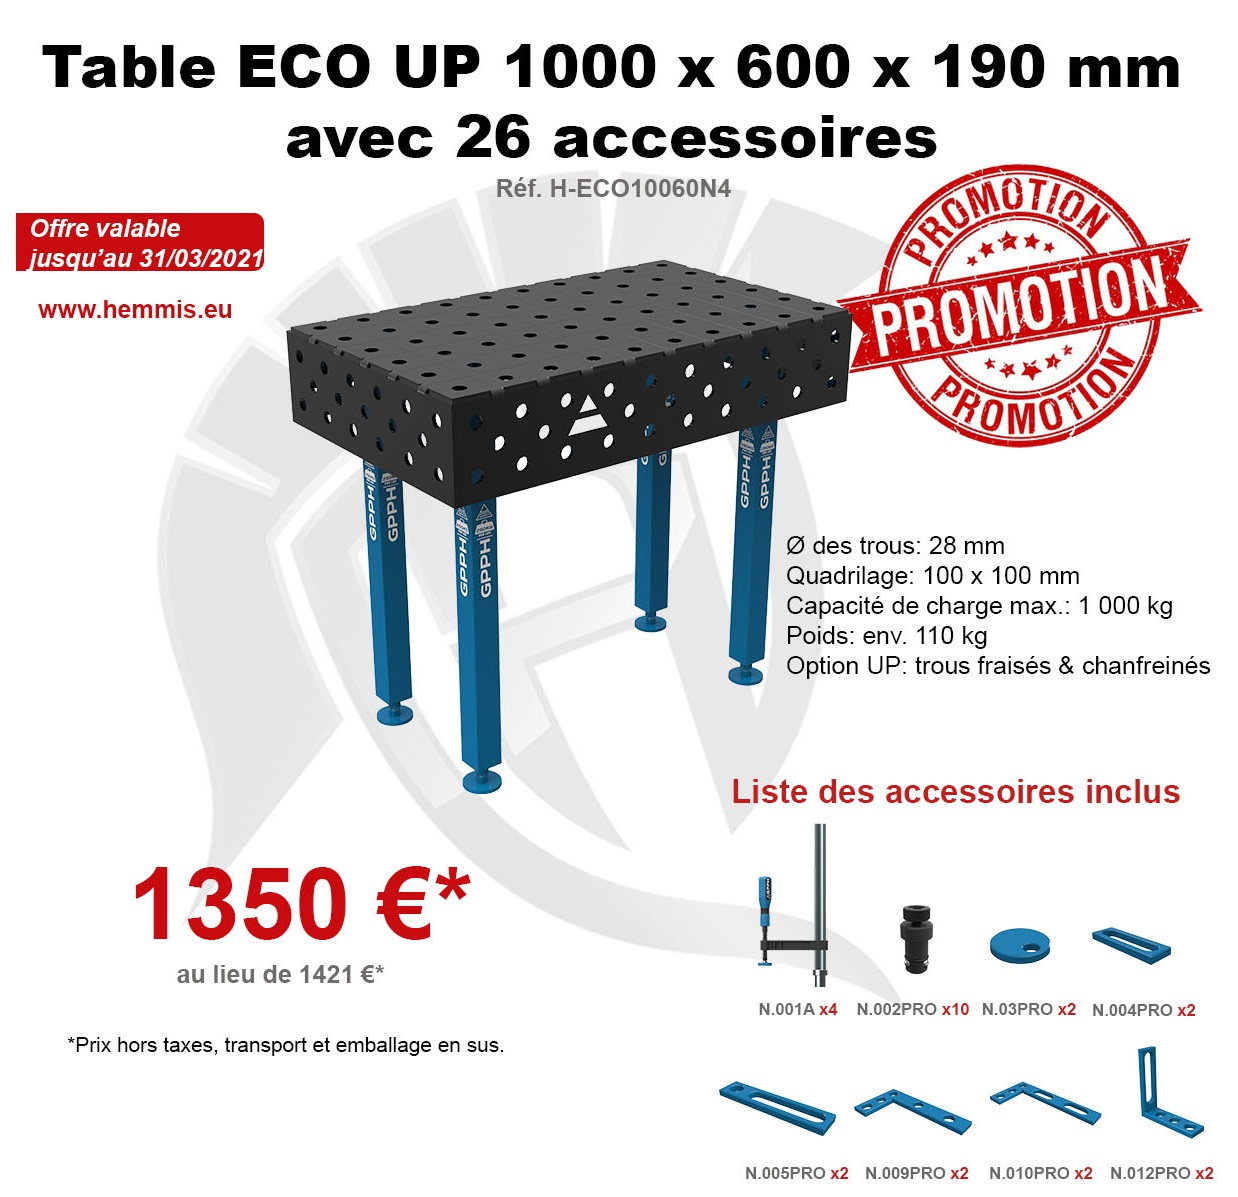 promotion table ECO 1er trimestre